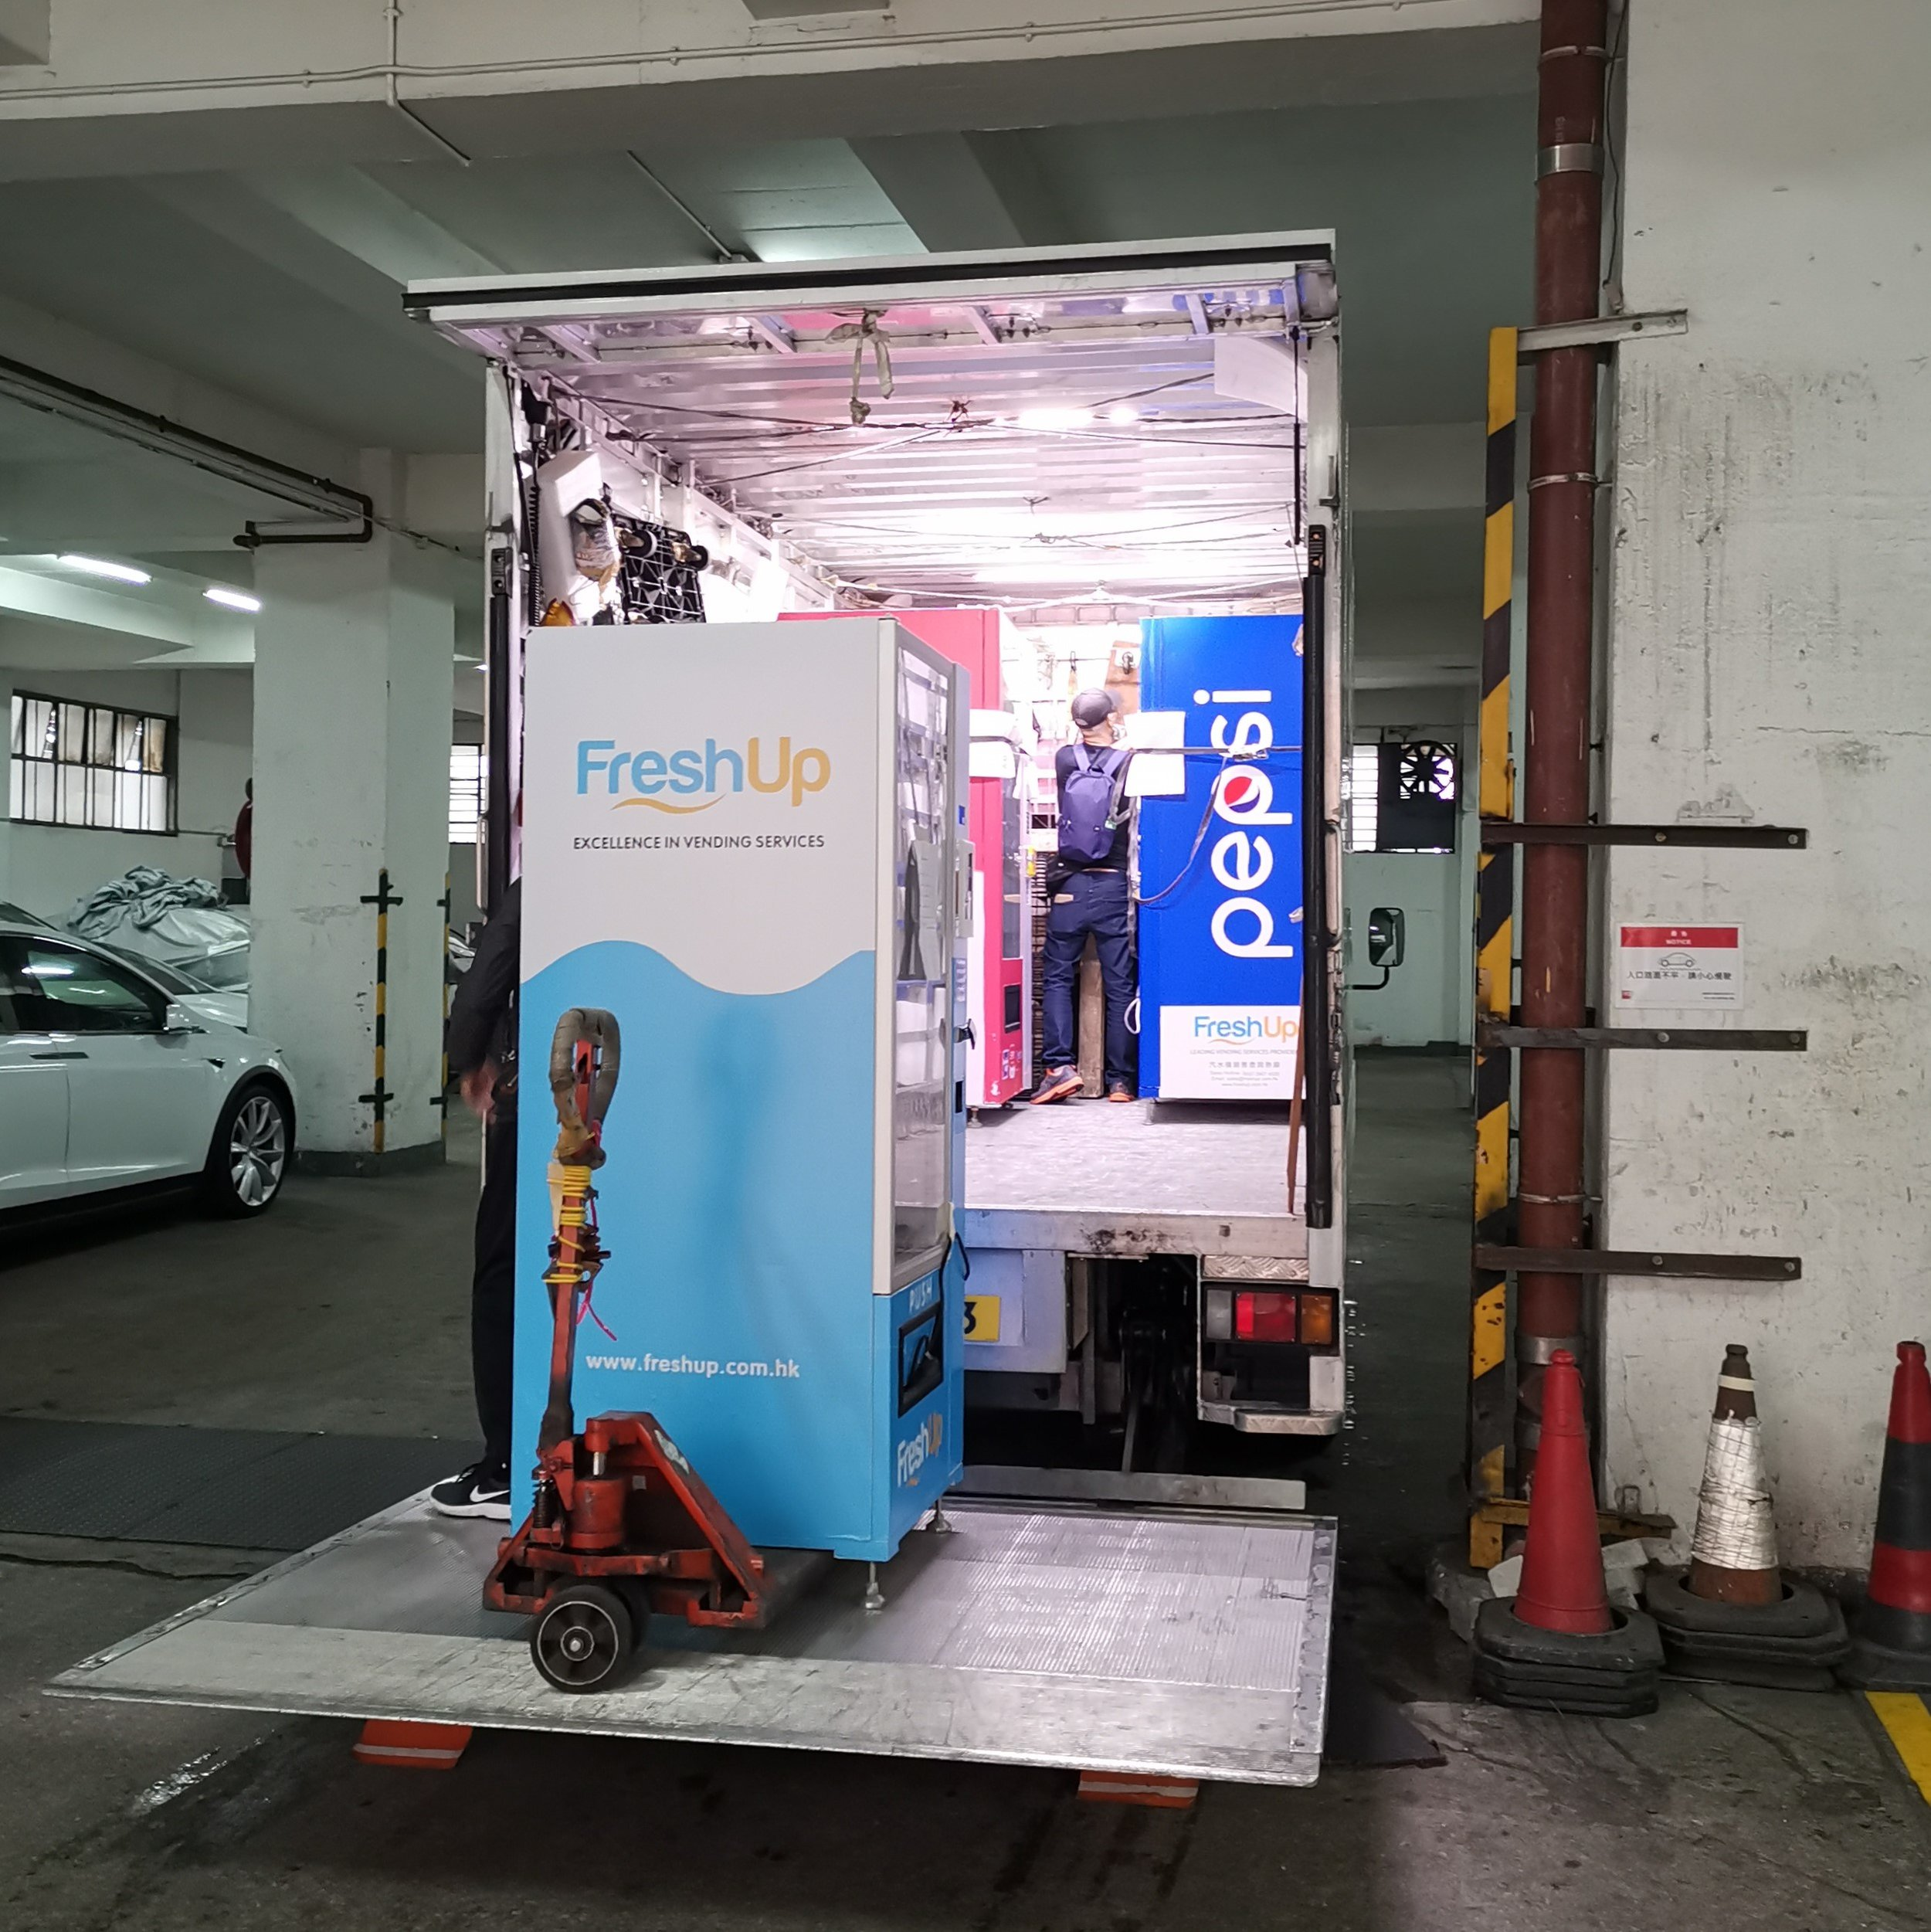 FreshUp Vending Machine Delivery Truck Hong Kong.jpg